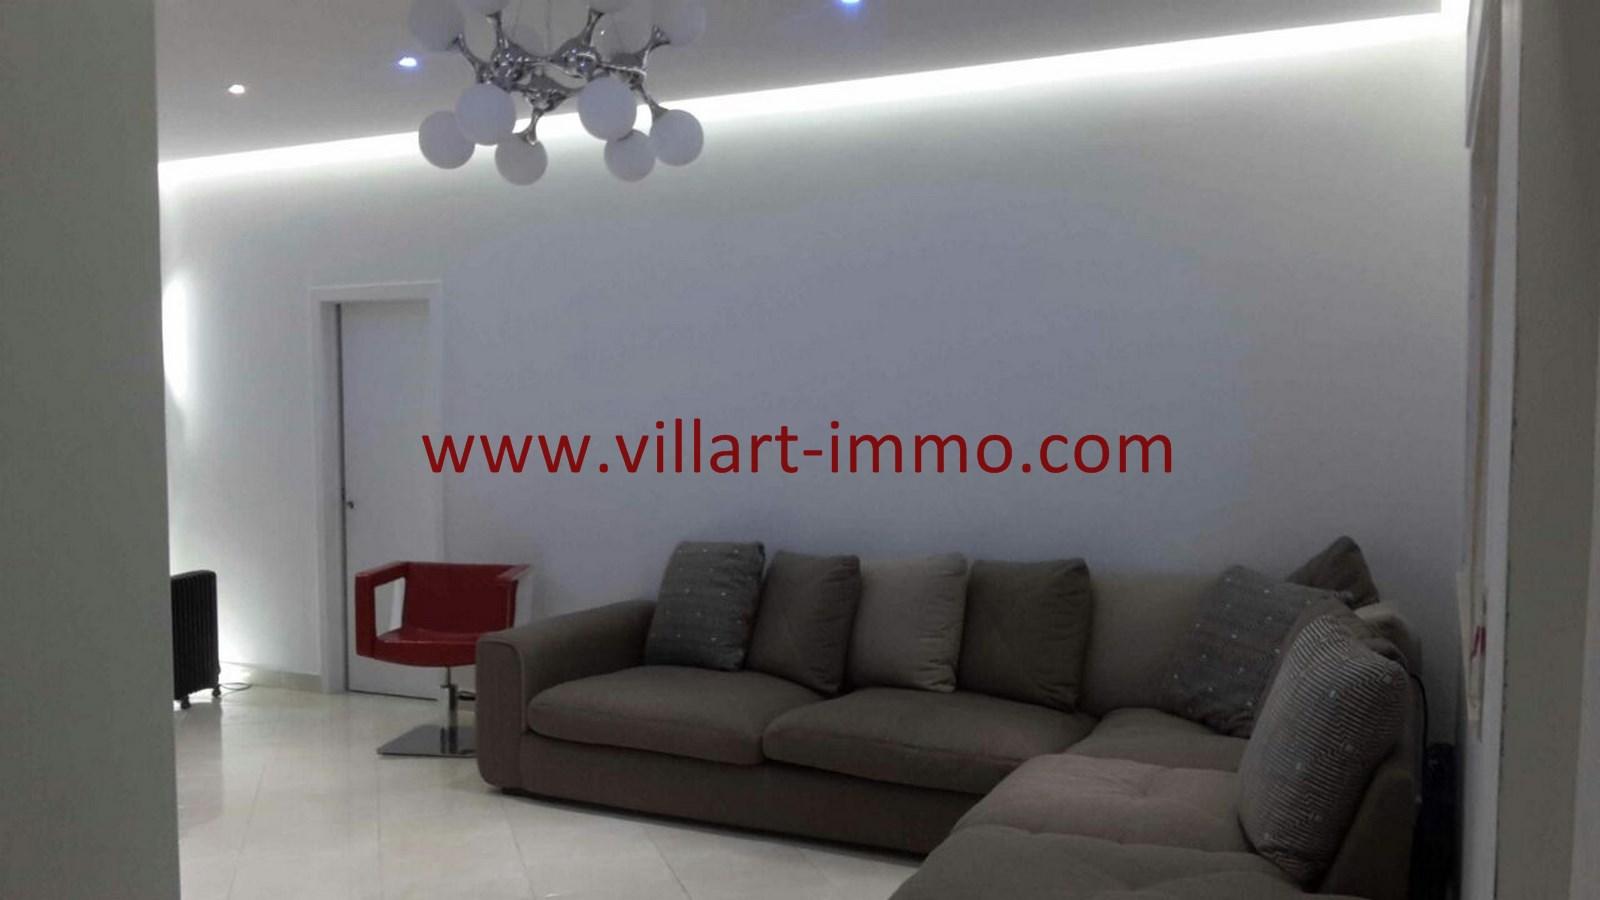 3-Vente-Appartement-Tanger-Malabata-Salon 2-VA490-Villart Immo (Copier)